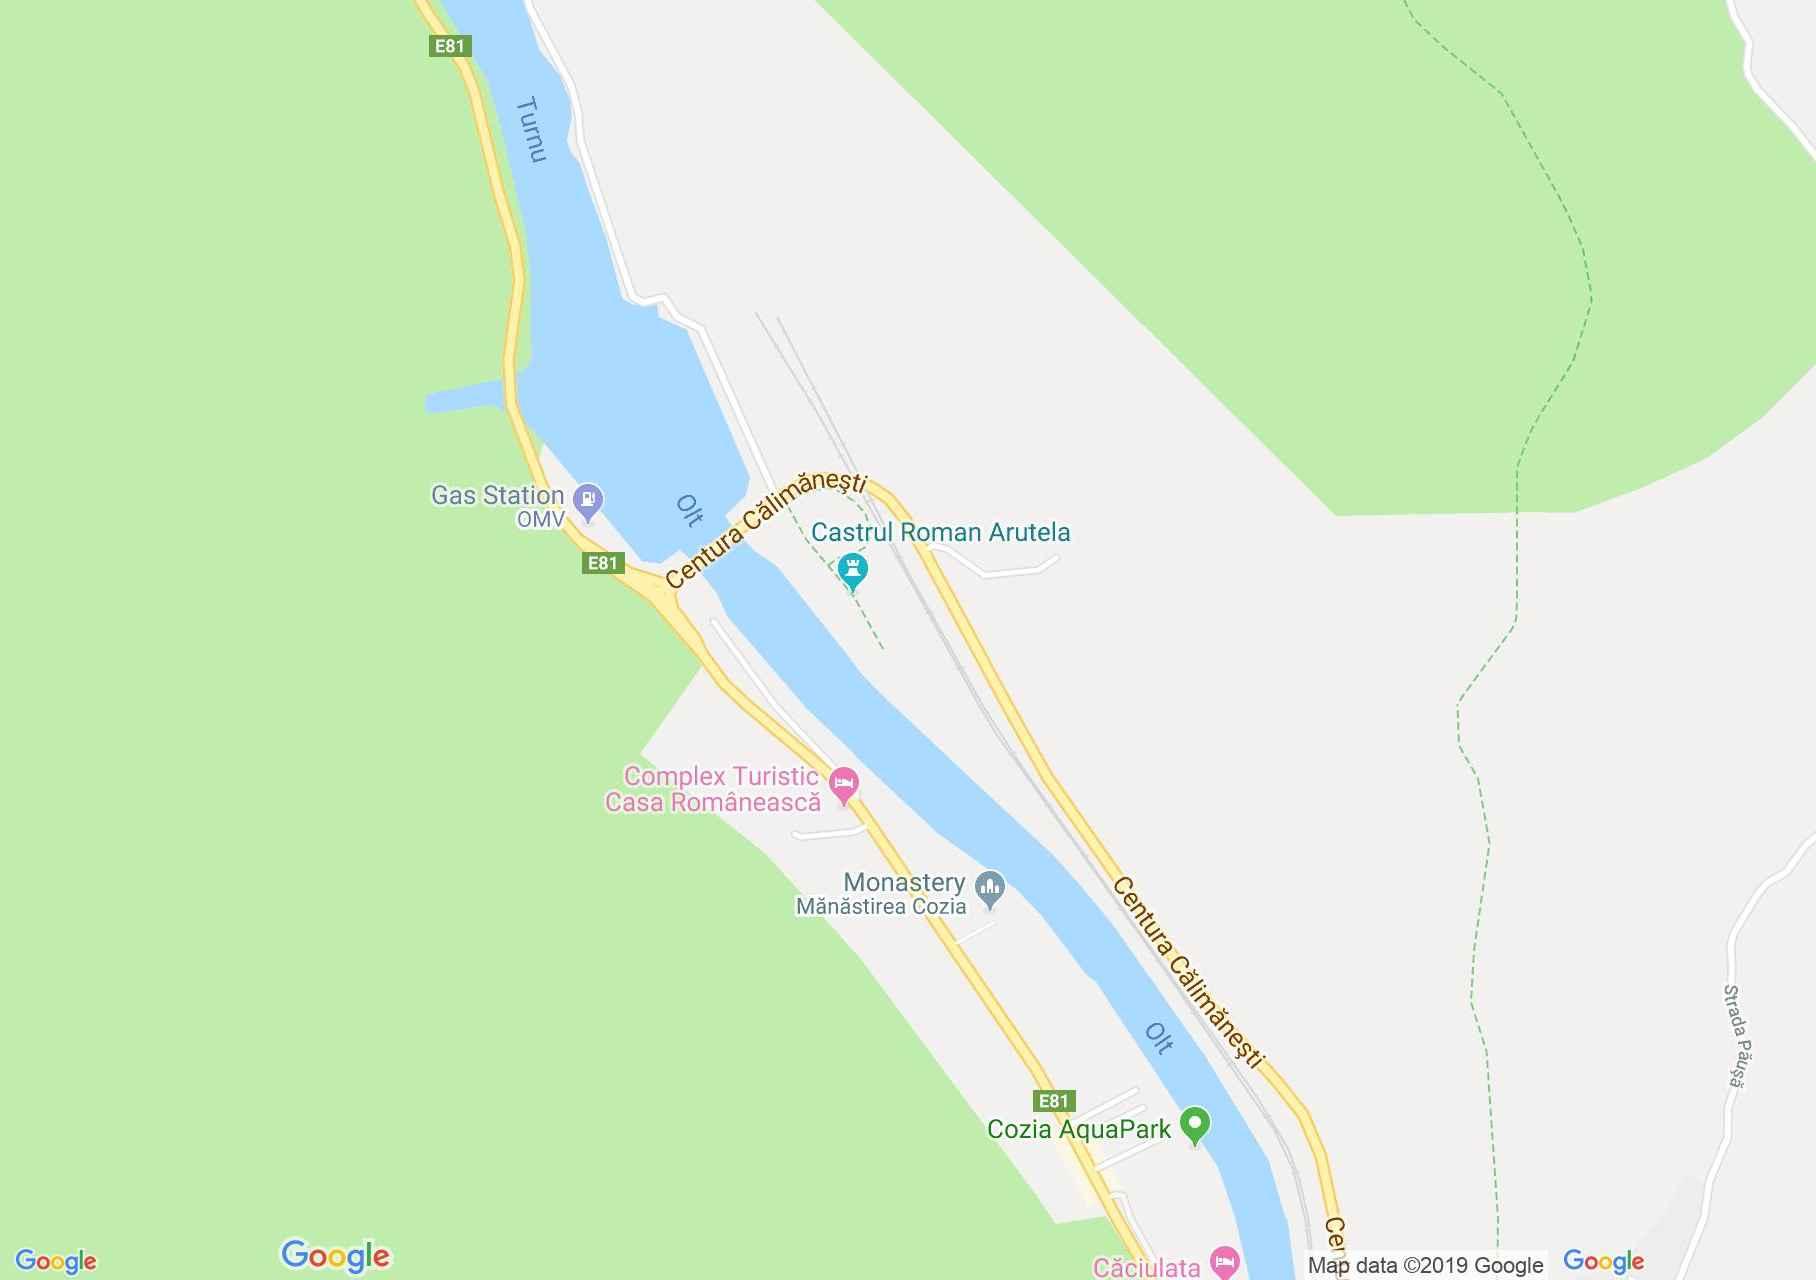 Călimăneşti: Cozia kolostor, Bolnita templom (térkép)